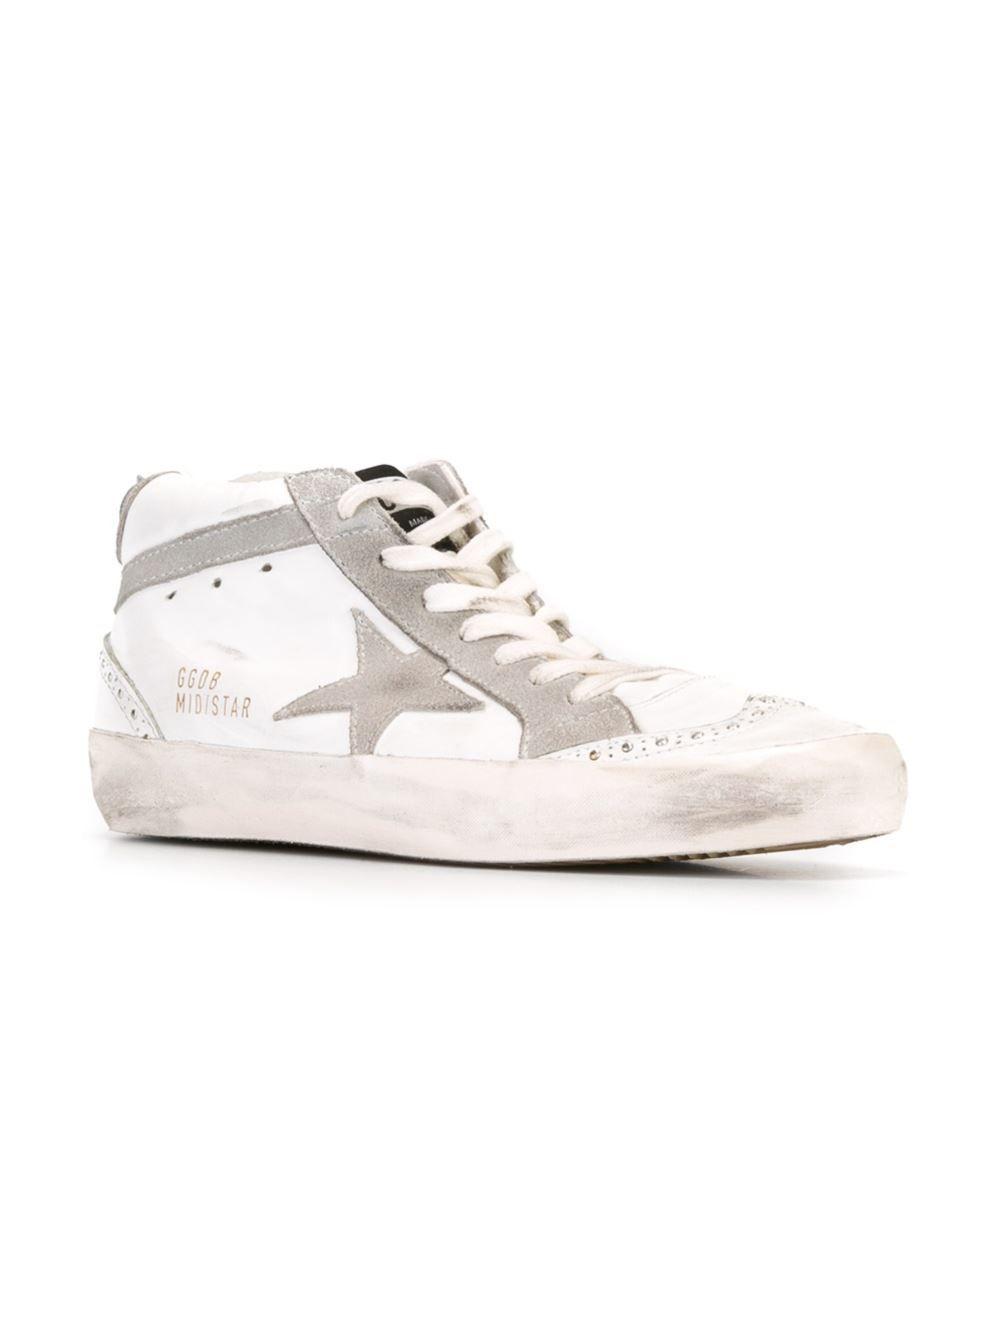 Oie D'or De Luxe Marque Sneakers Mi Étoiles - Gris xhbI7h